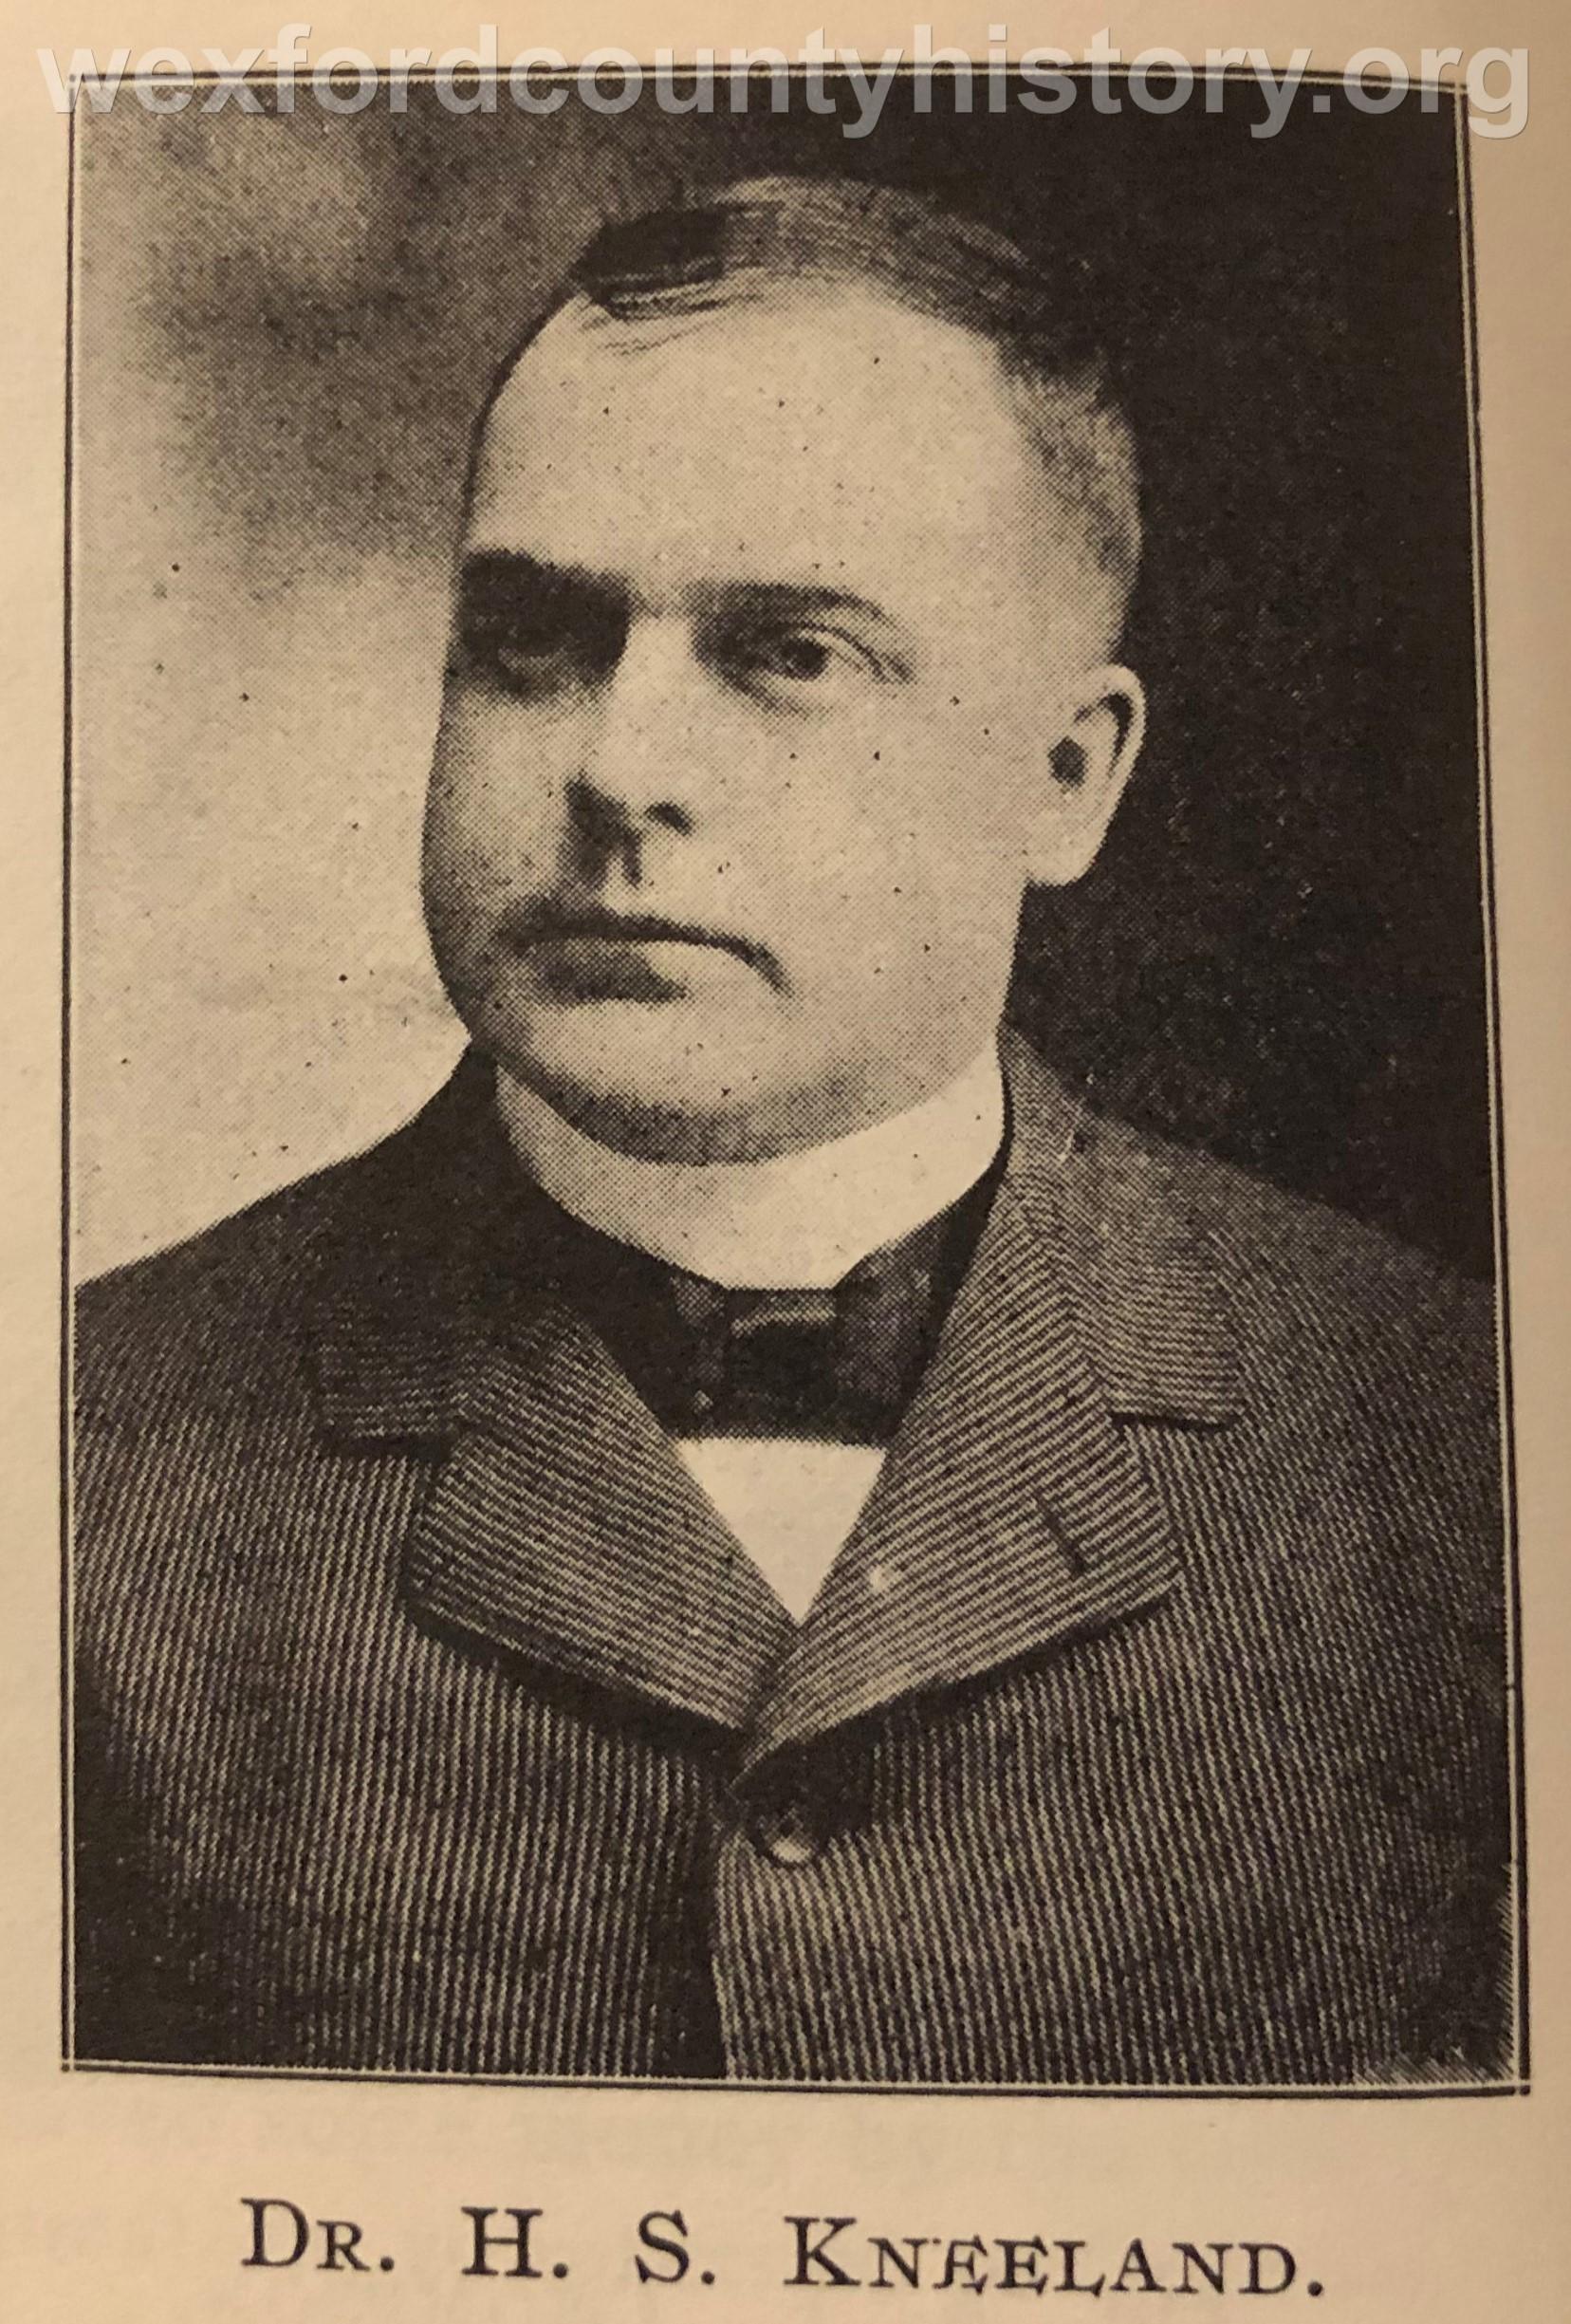 Dr. Howard S. Kneeland